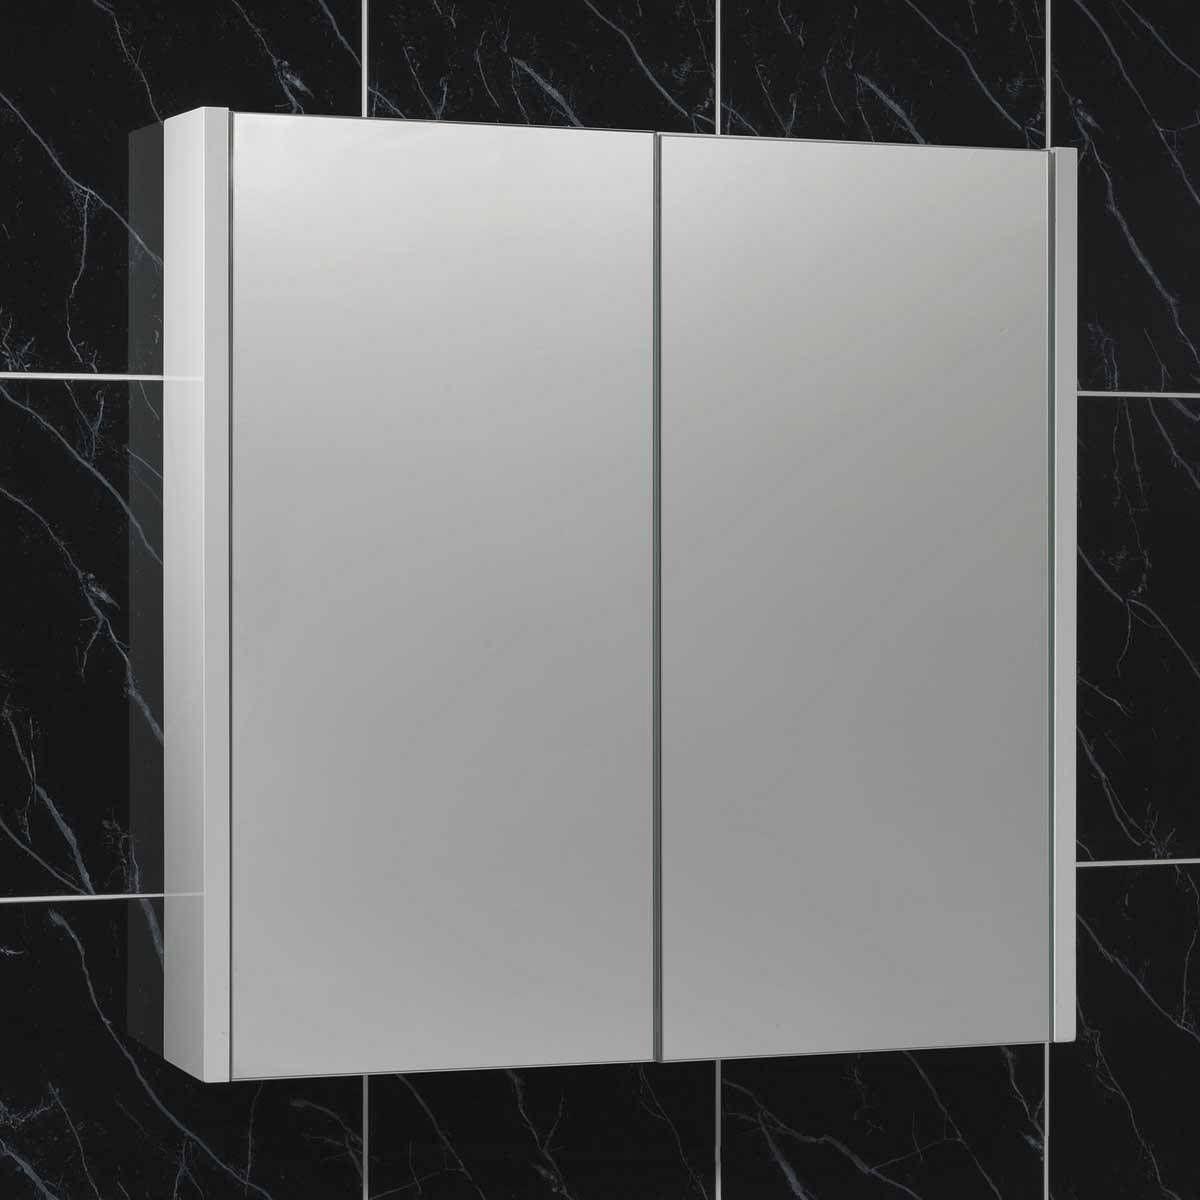 Bathroom Mirrors Victoria Plumb white 2 door mirror cabinet - victoria plumb | main bathroom